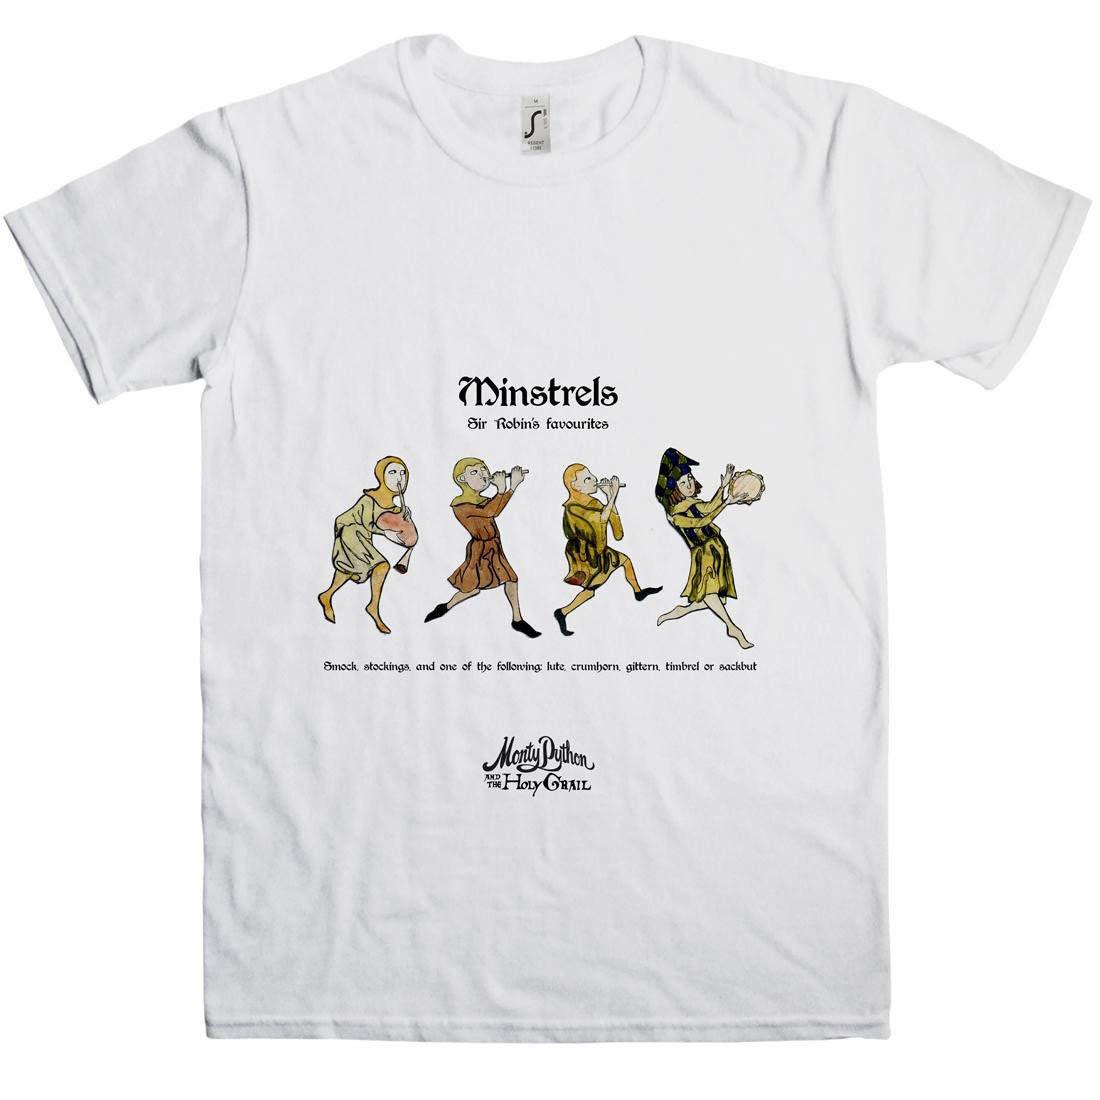 edb0e68cf Monty Python: Holy Grail Minstrels T-Shirt